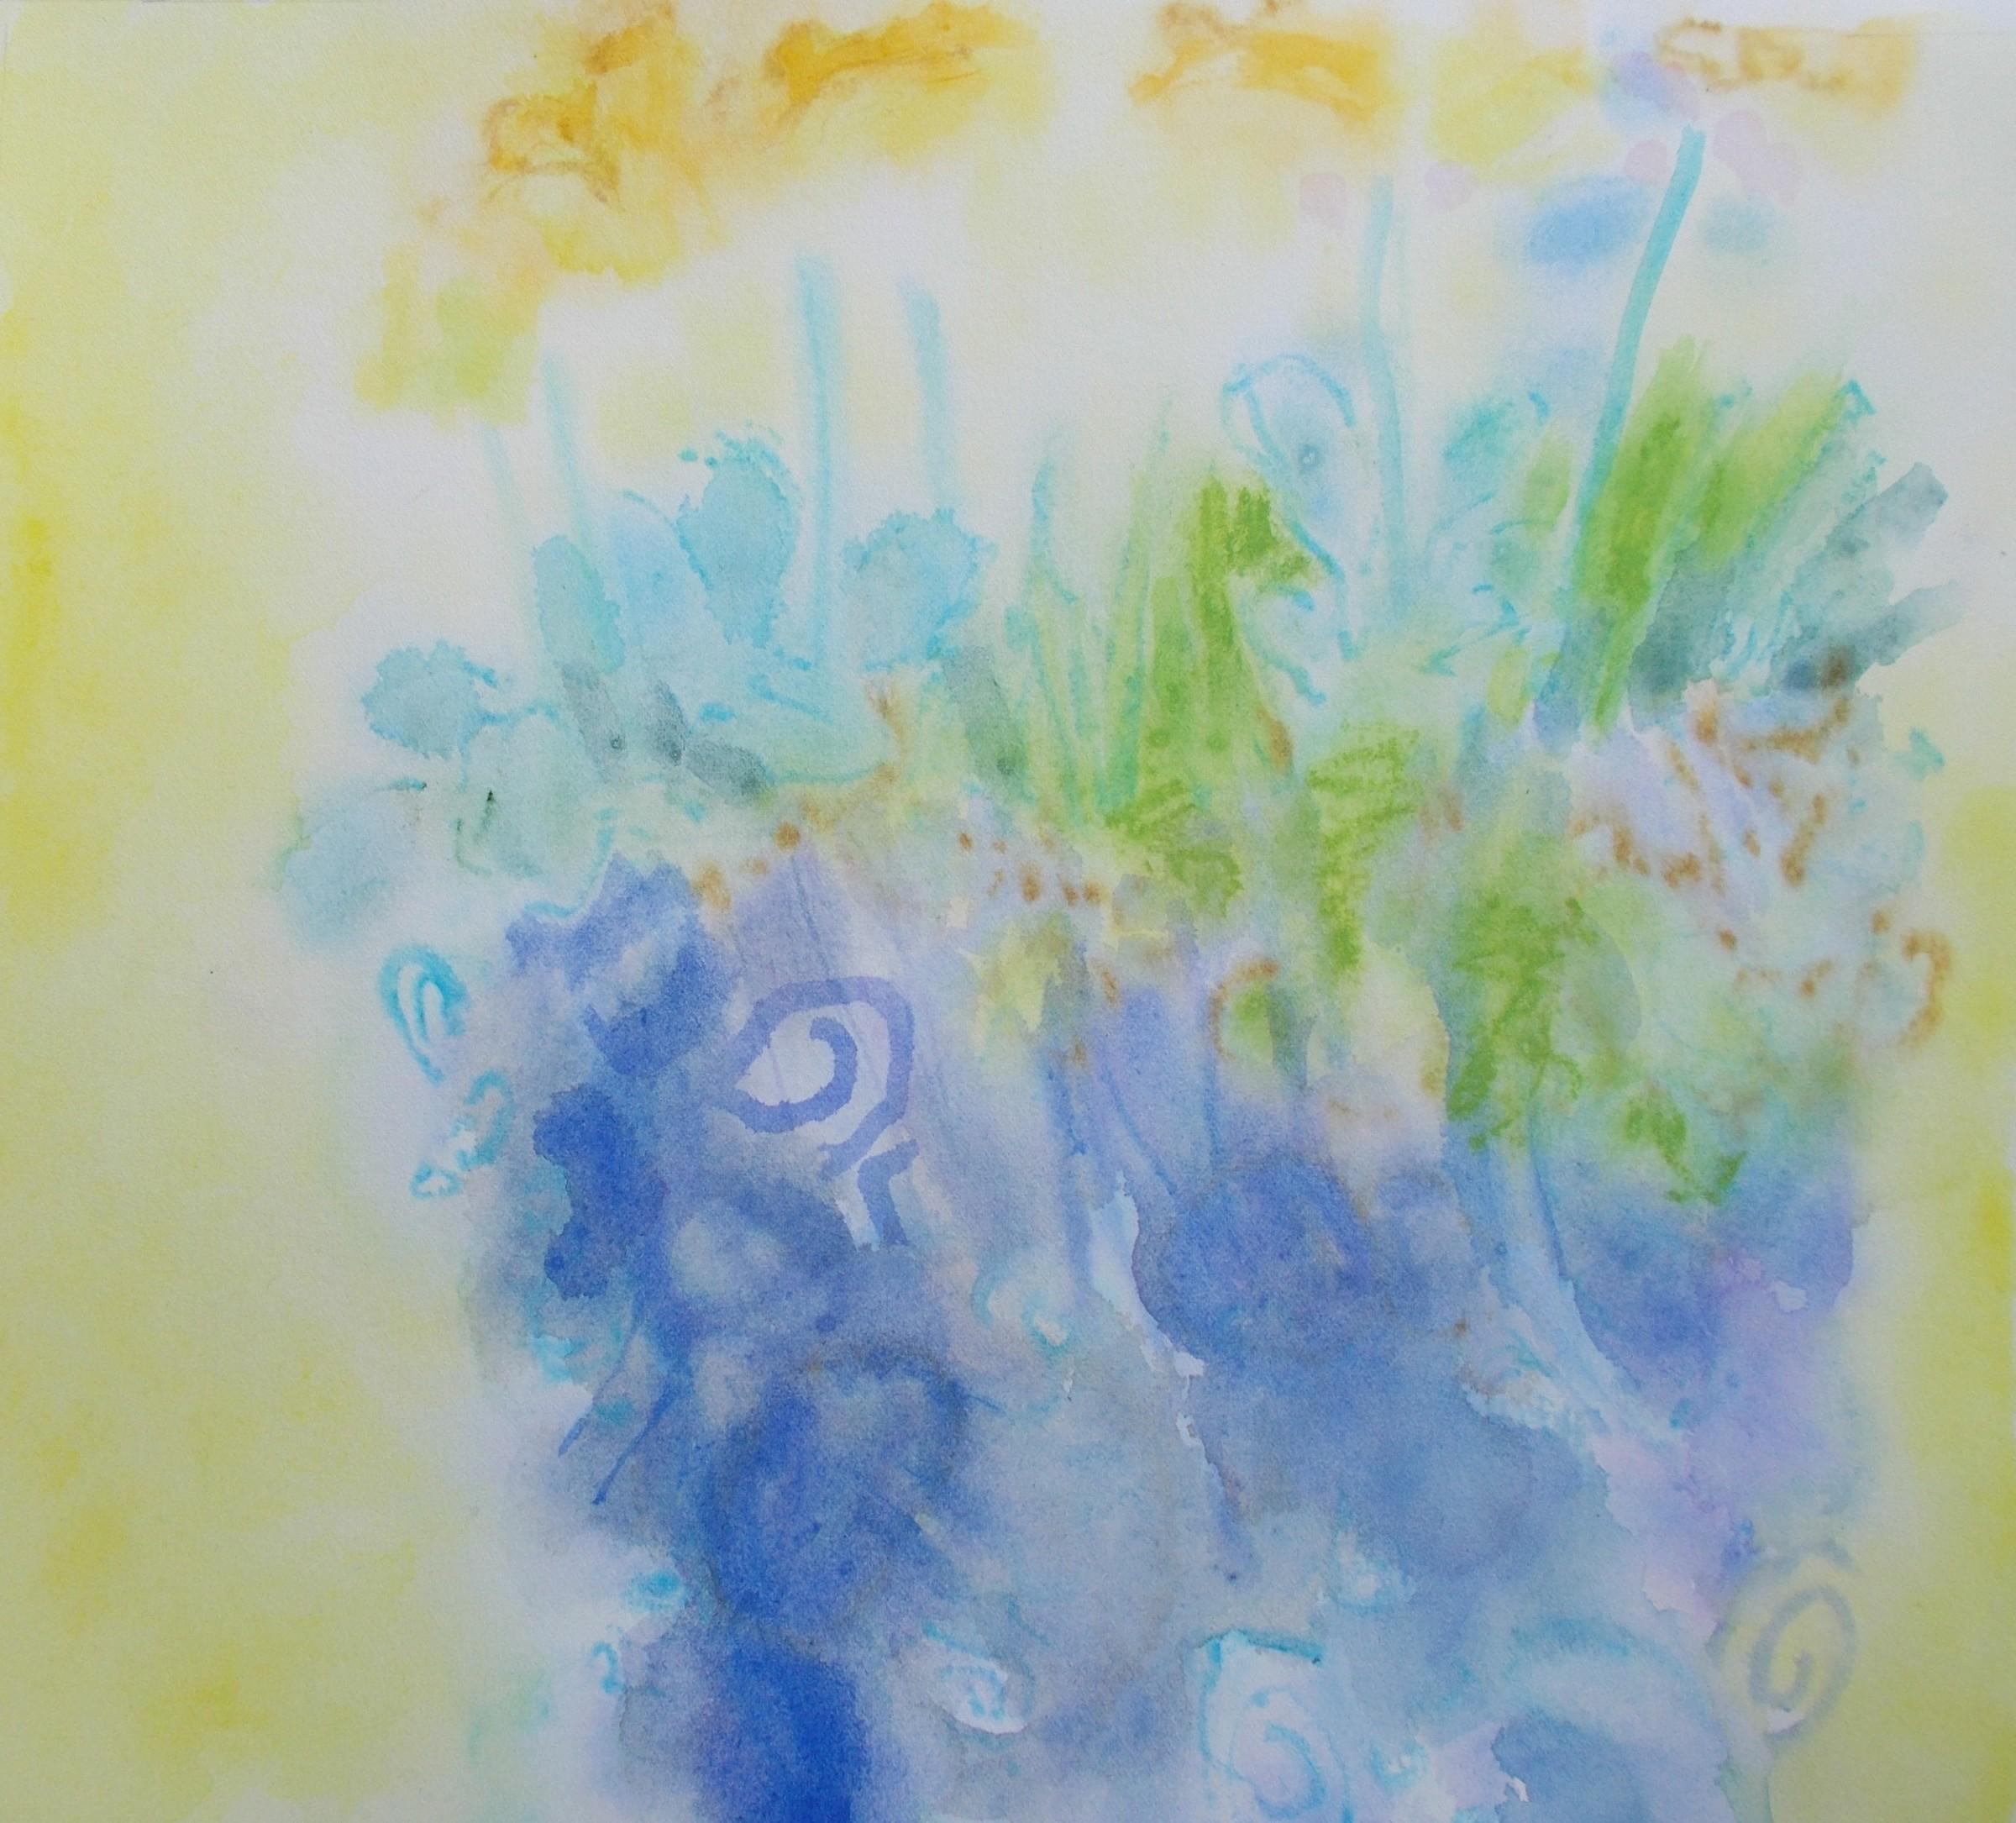 "<span class=""link fancybox-details-link""><a href=""/artists/80-anne-marlow/works/12413-anne-marlow-a-summer-meadow/"">View Detail Page</a></span><div class=""artist""><span class=""artist""><strong>Anne Marlow</strong></span></div><div class=""title""><em>A Summer Meadow</em></div><div class=""medium"">watercolour</div><div class=""dimensions"">Frame: 39.5 x 43 cm<br /> Artwork: 27 x 30 cm</div><div class=""price"">£275.00</div>"